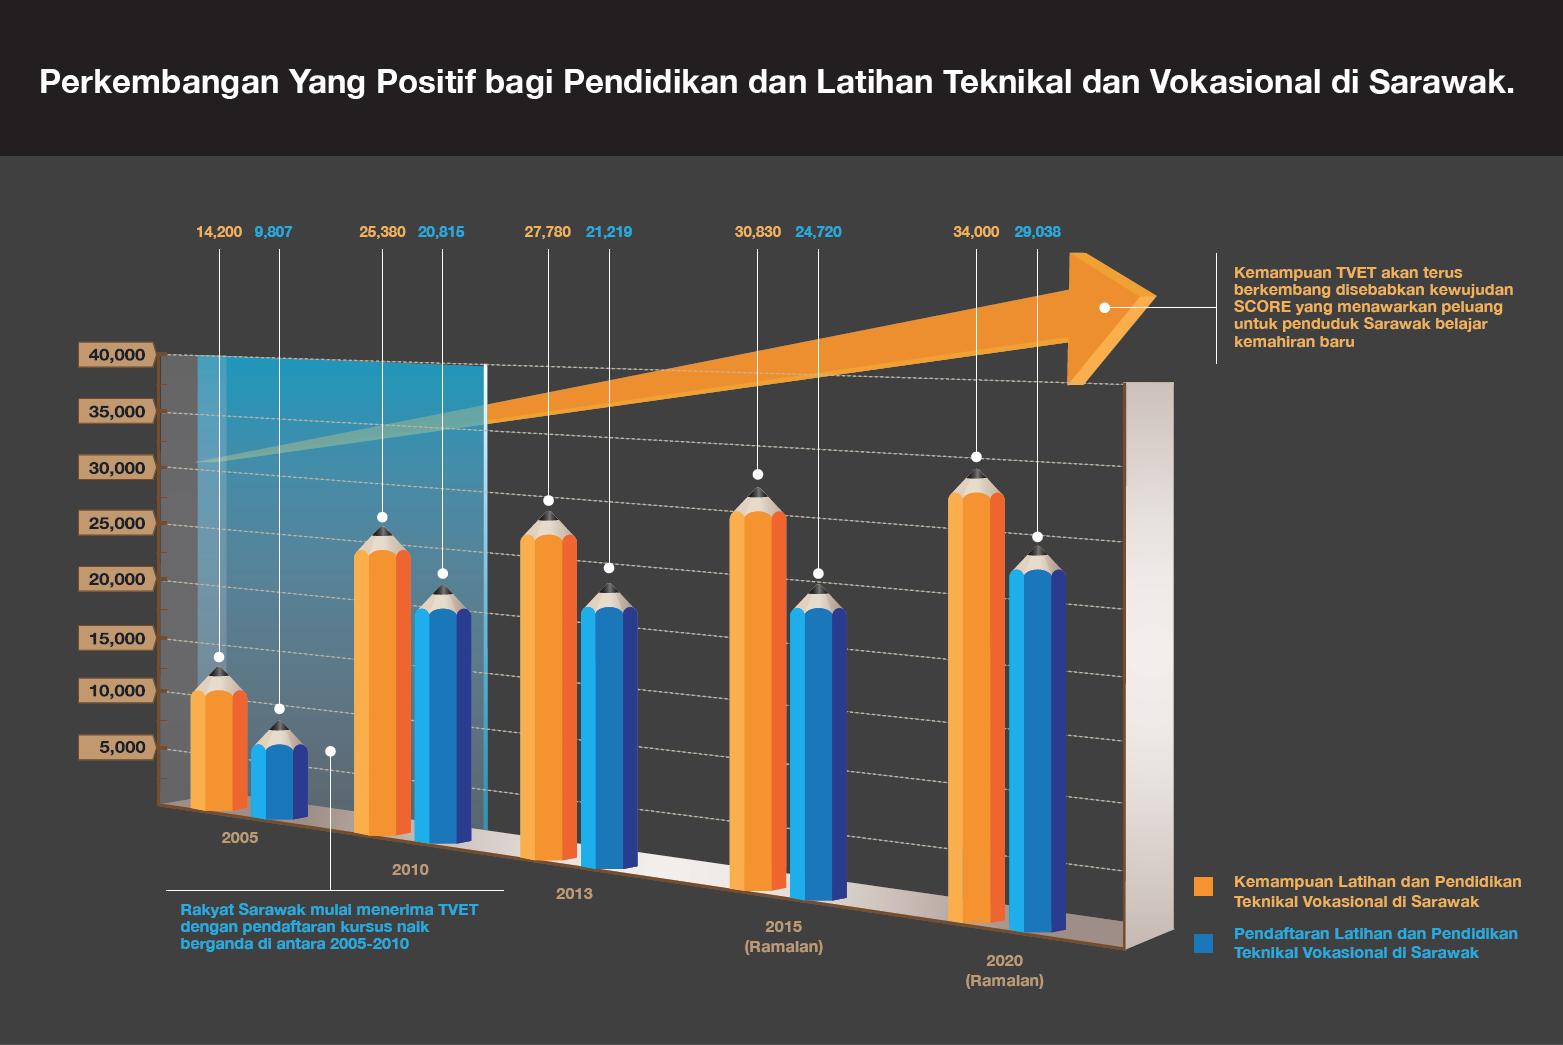 Perkembangan Latihan dan Pendidikan Teknikal Vokasional di Sarawak